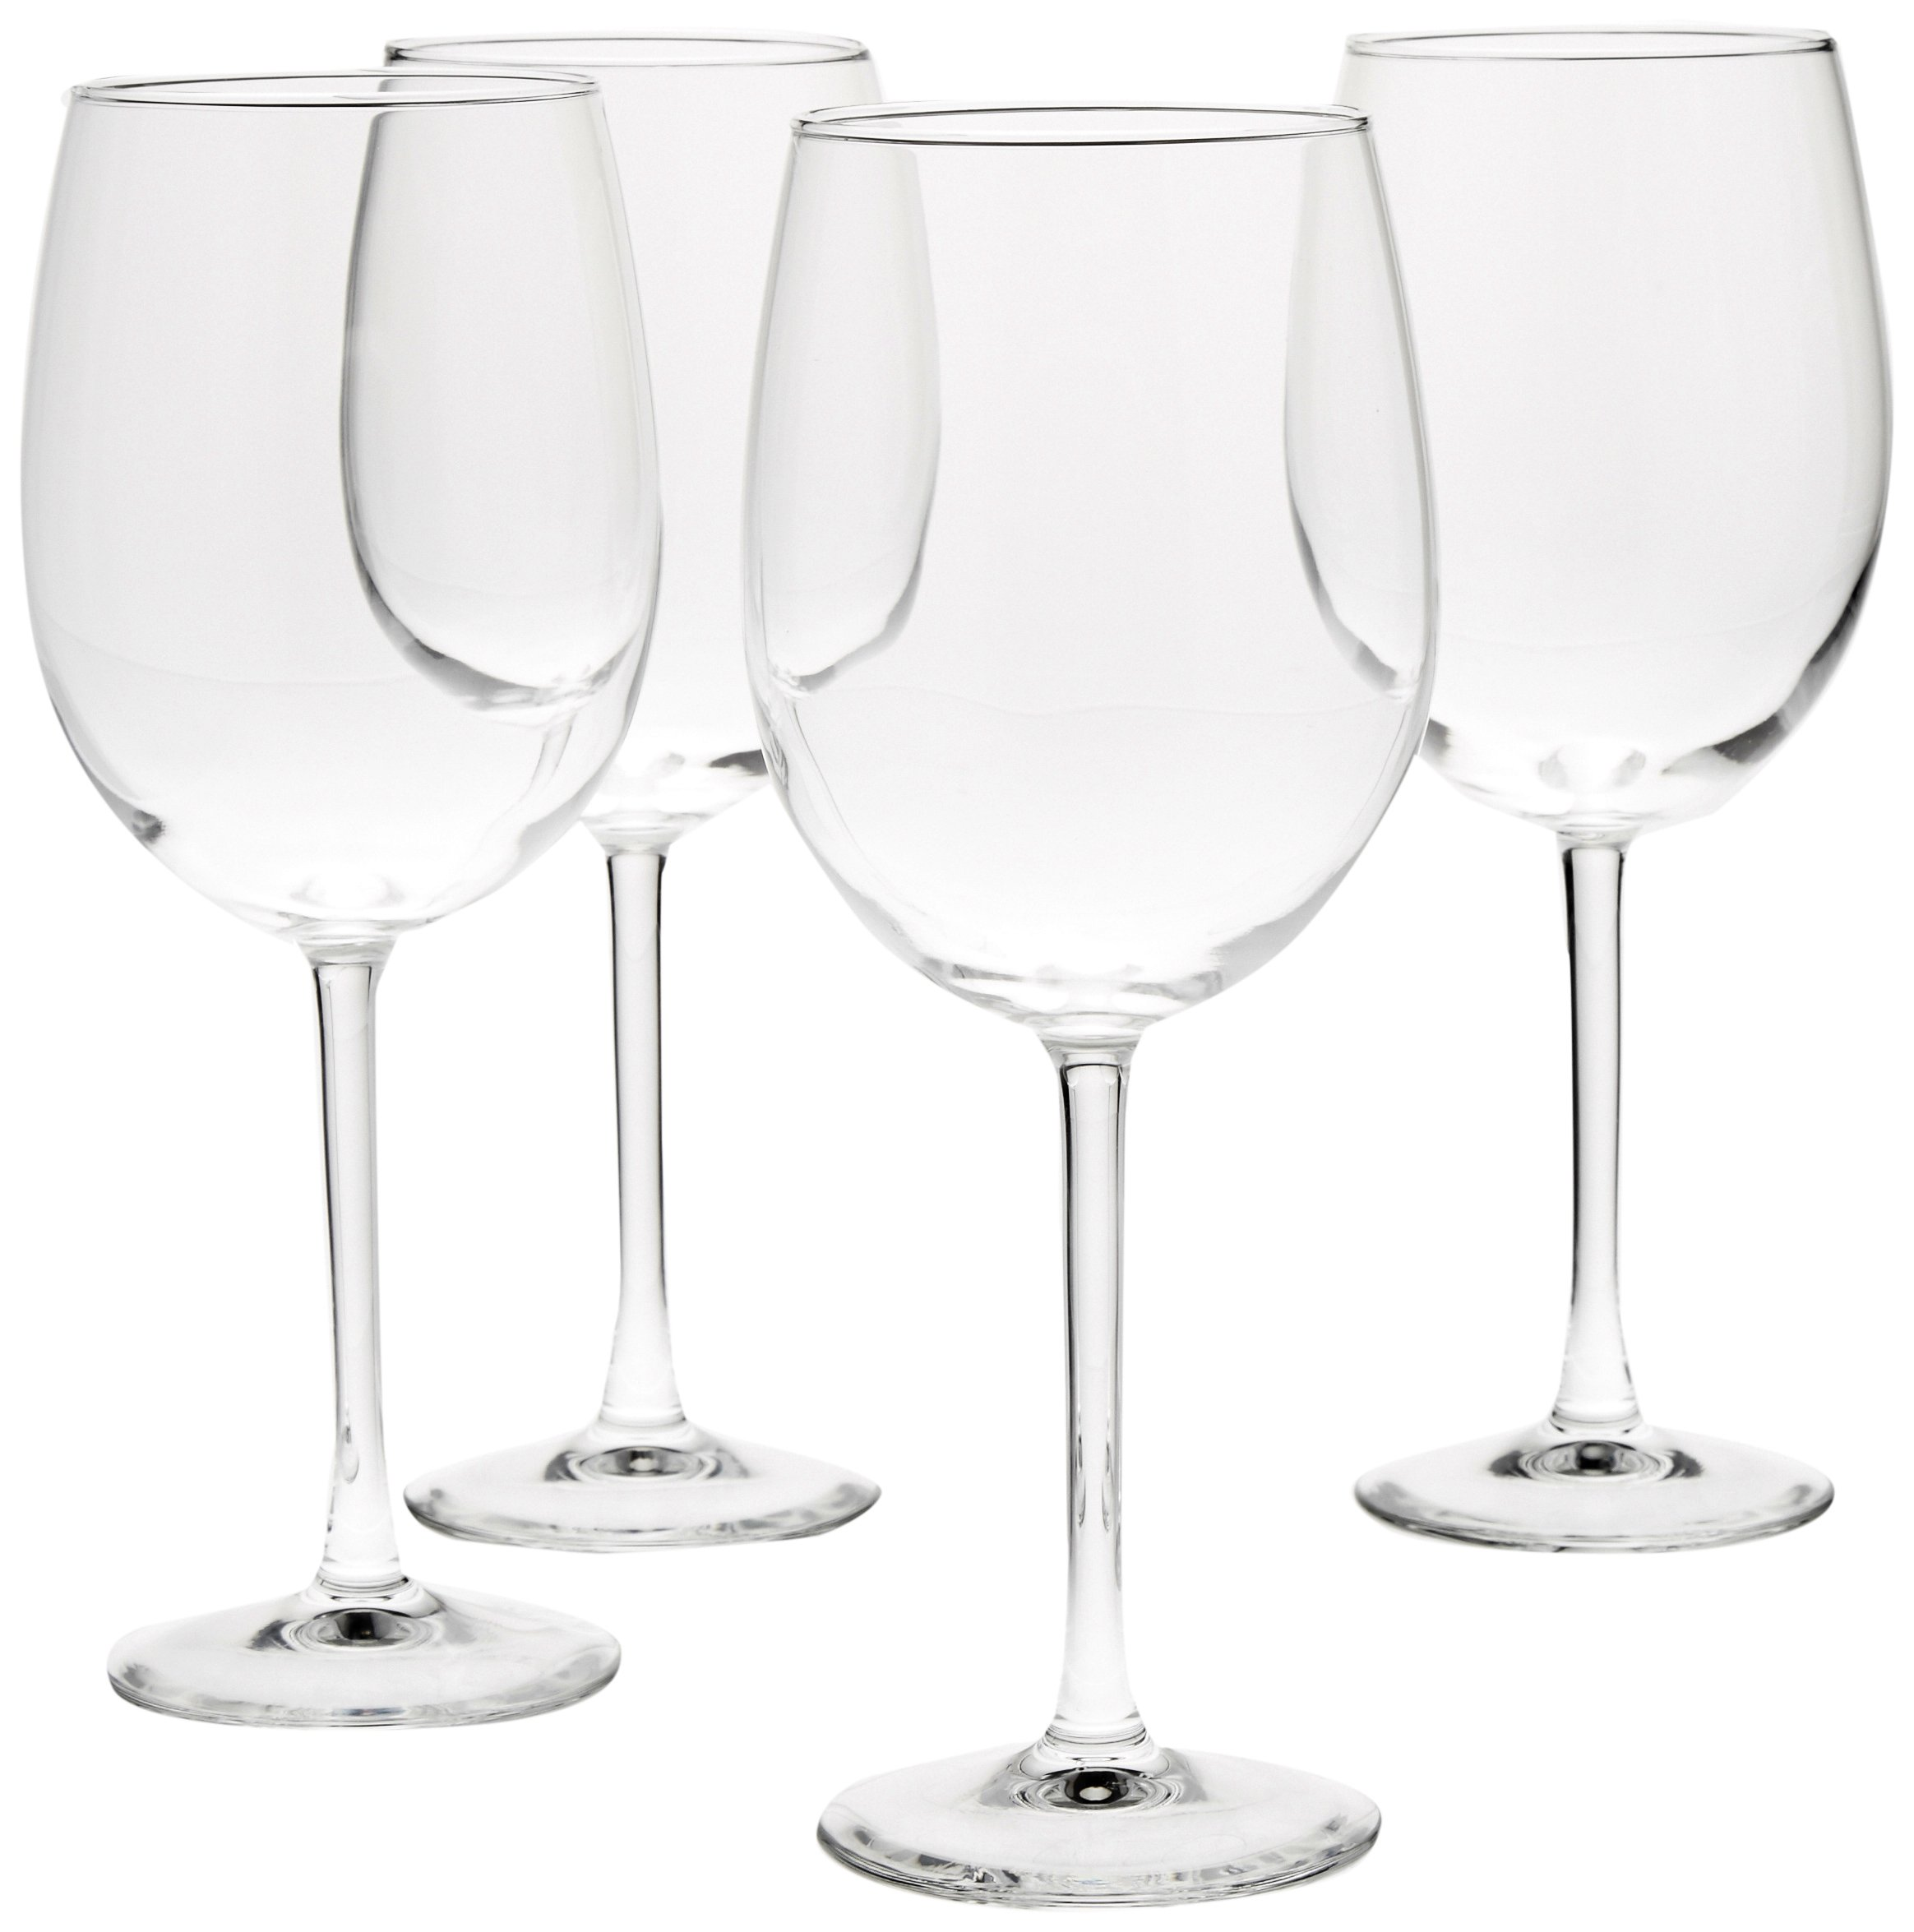 AmazonBasics All-Purpose Wine Glasses, 19-Ounce, Set of 4 by AmazonBasics